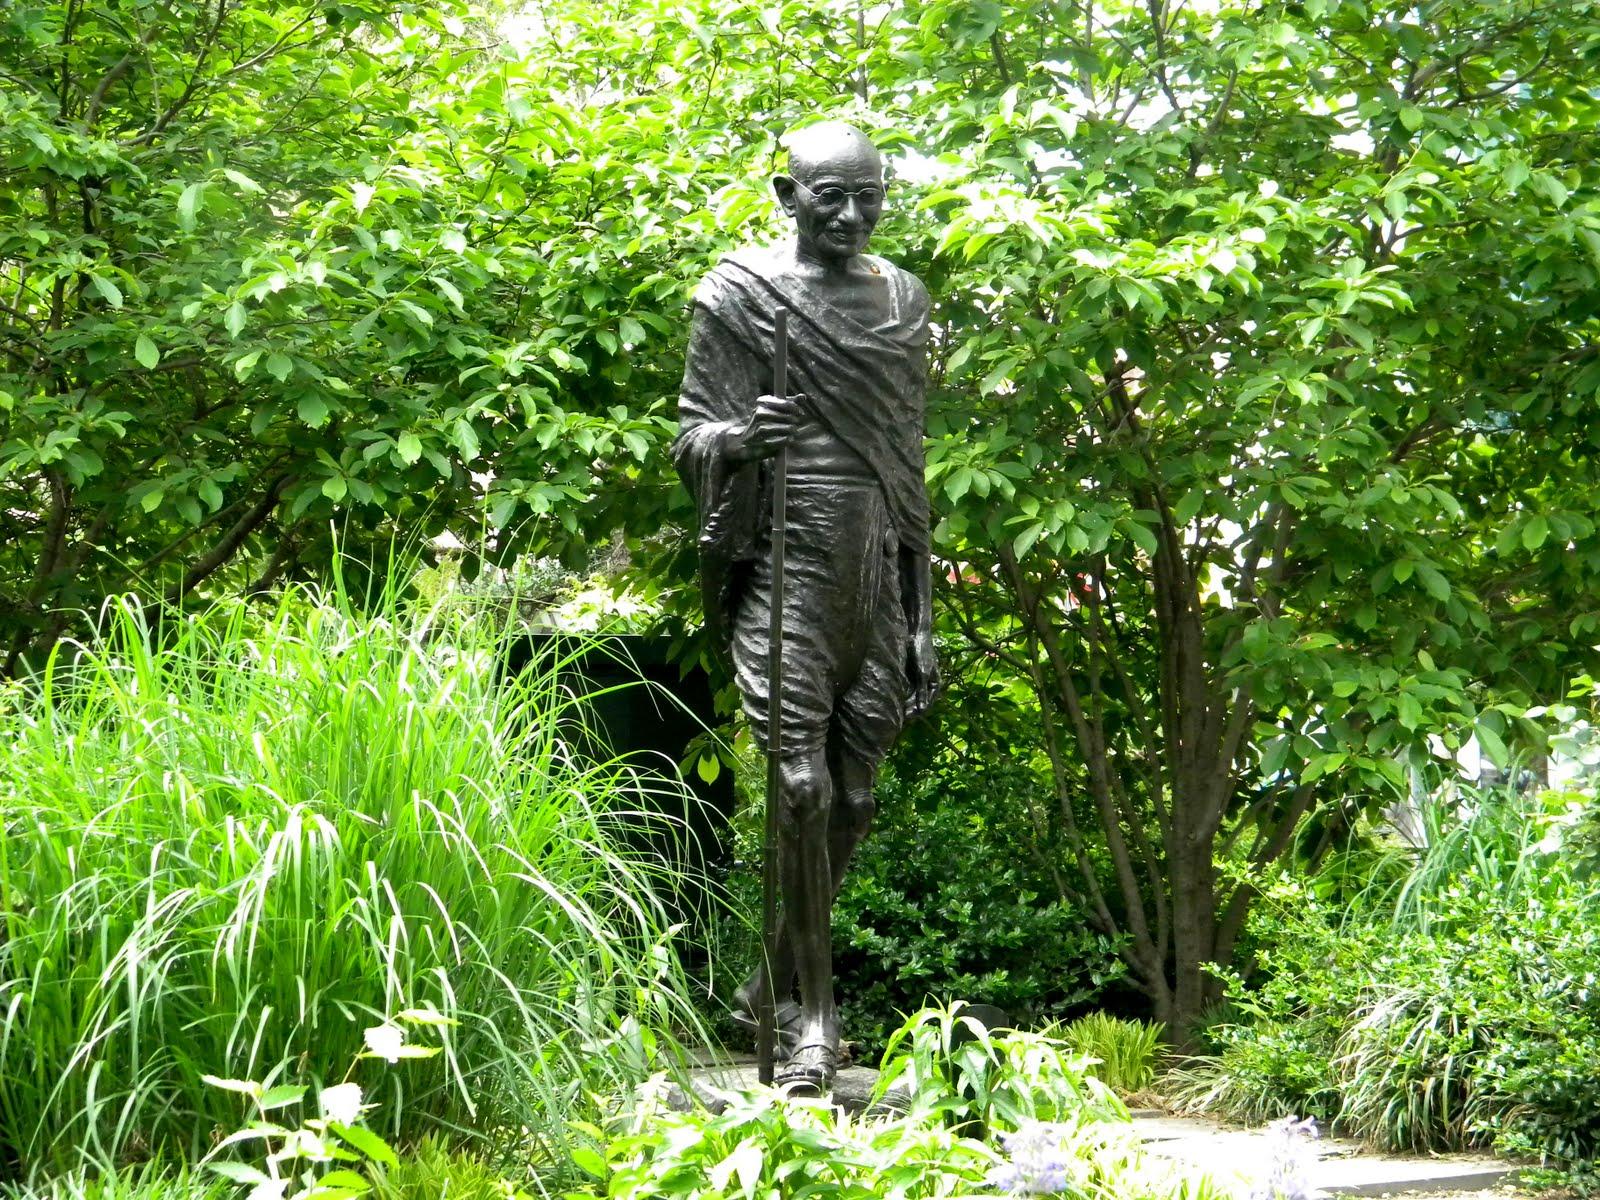 Mohandas Gandhi Statue Union Square Park